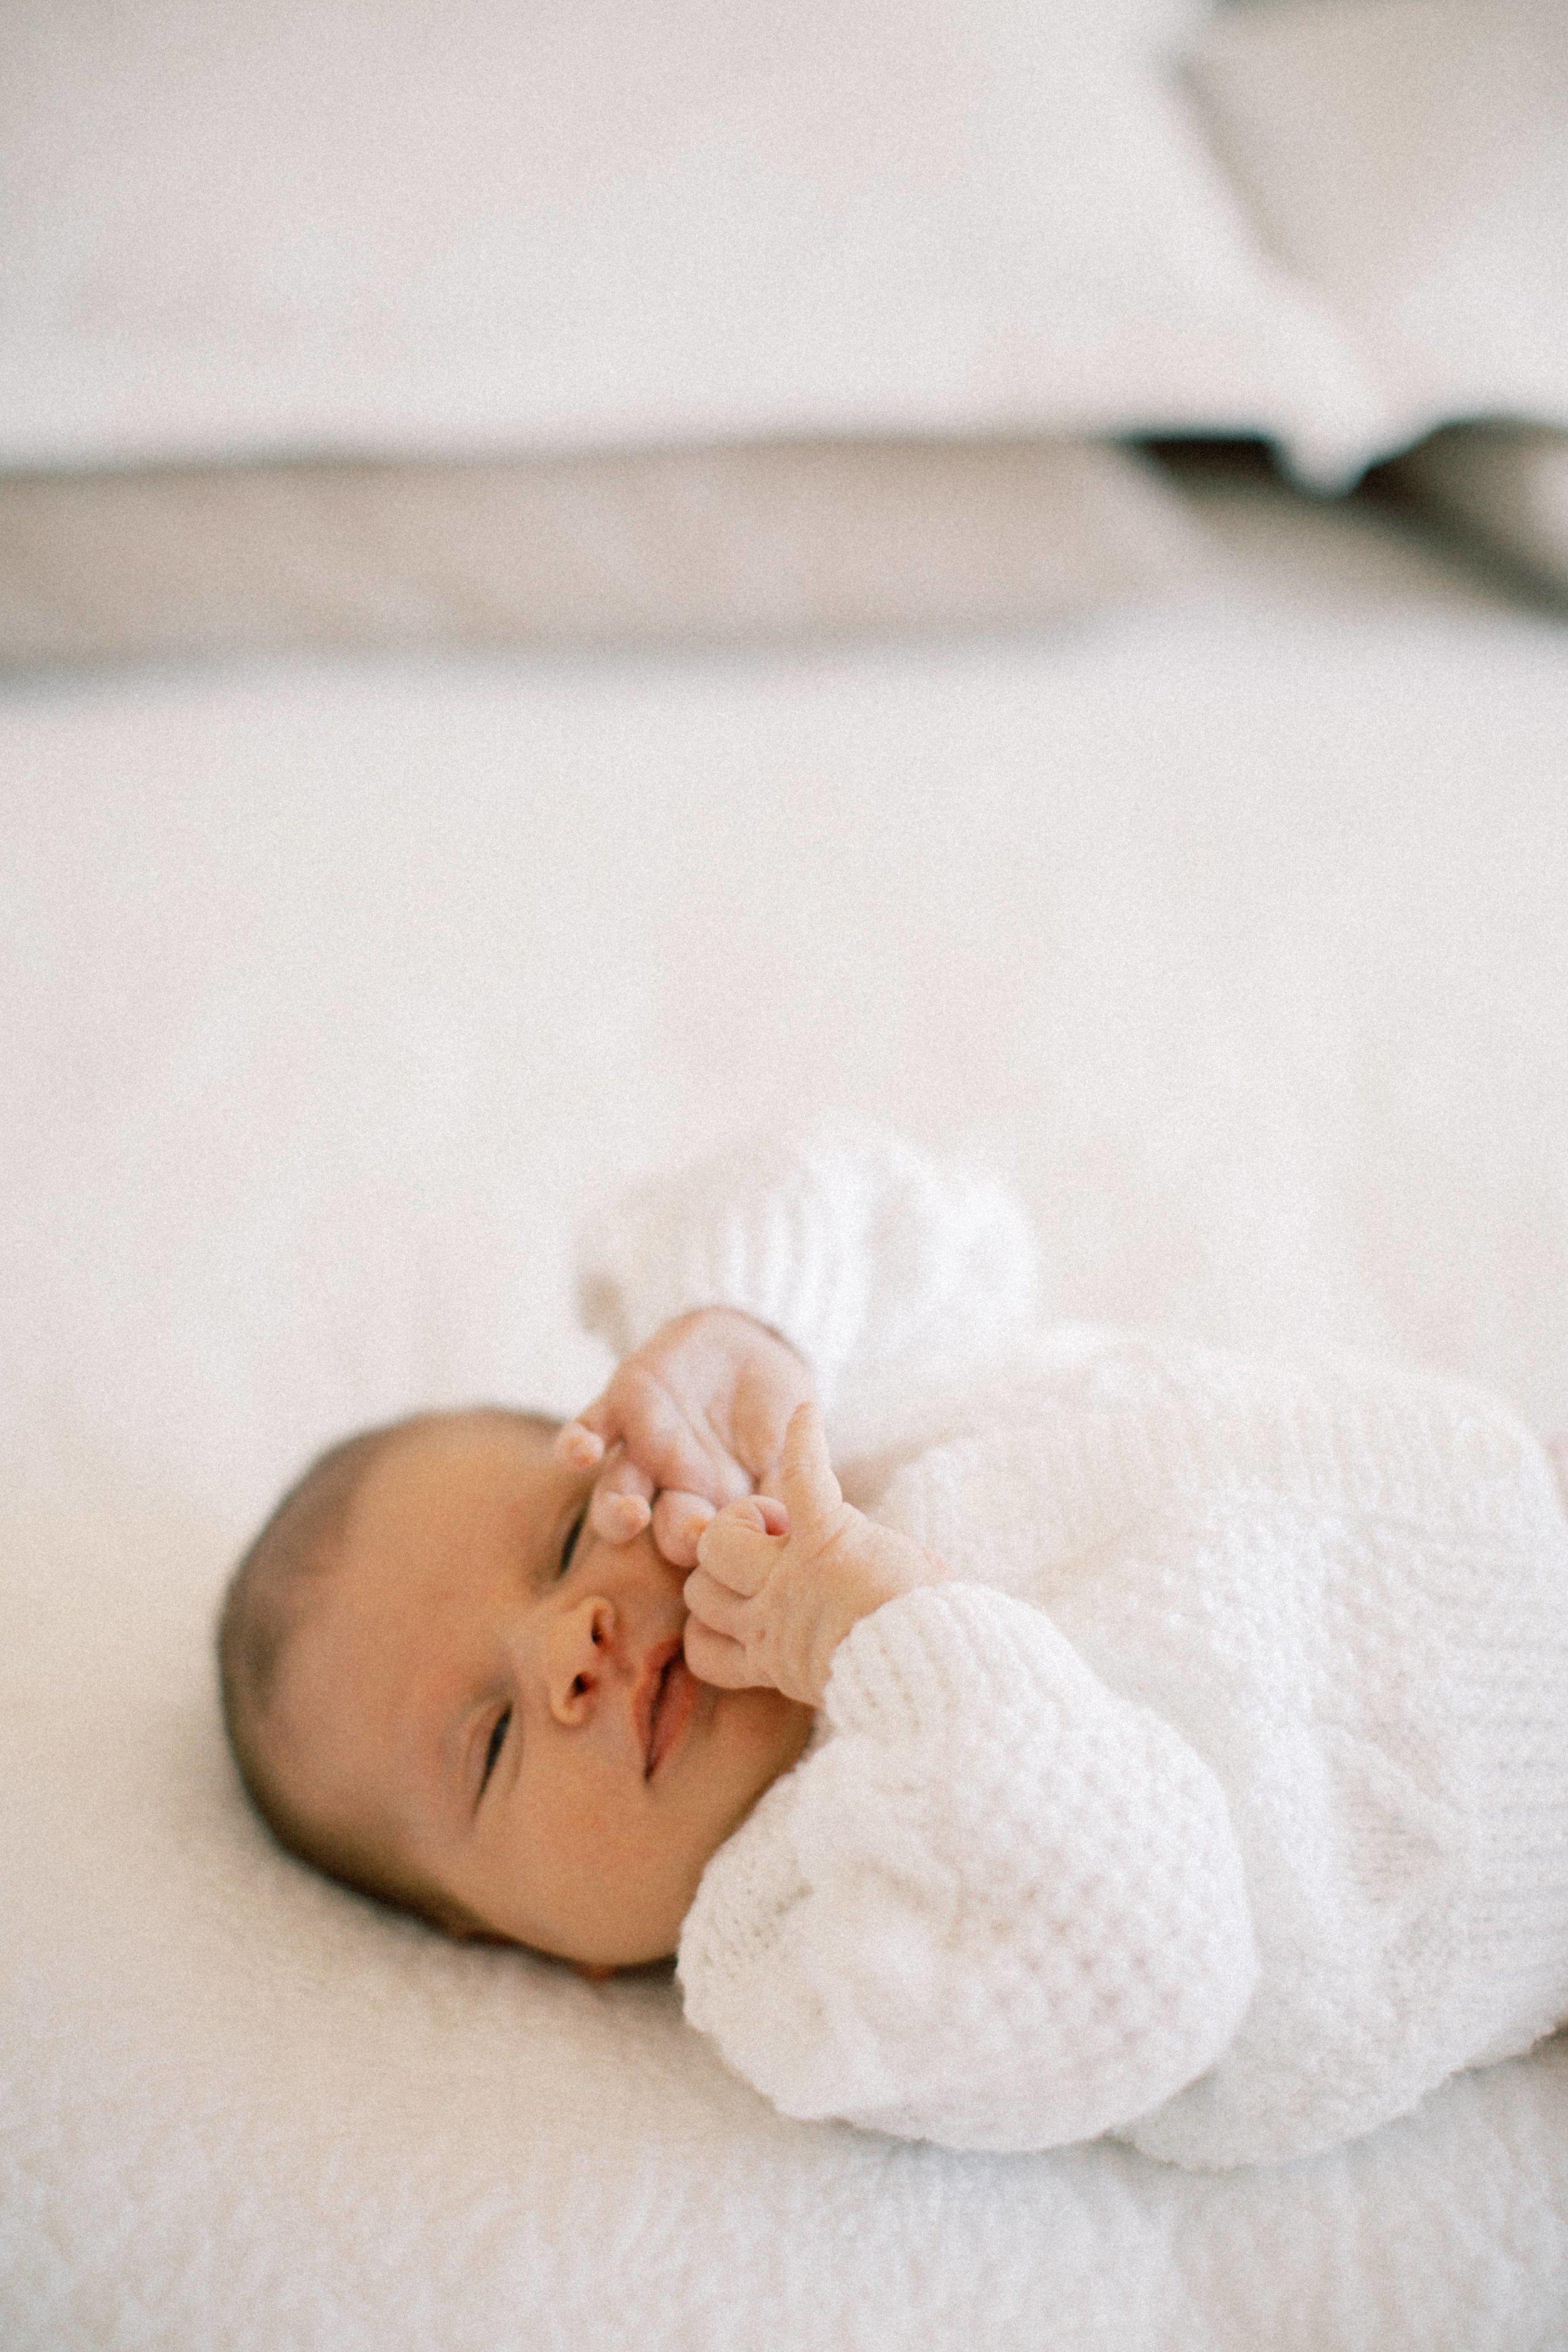 AmeliaClairePhotography_Mia_Newborn-1-83.jpeg